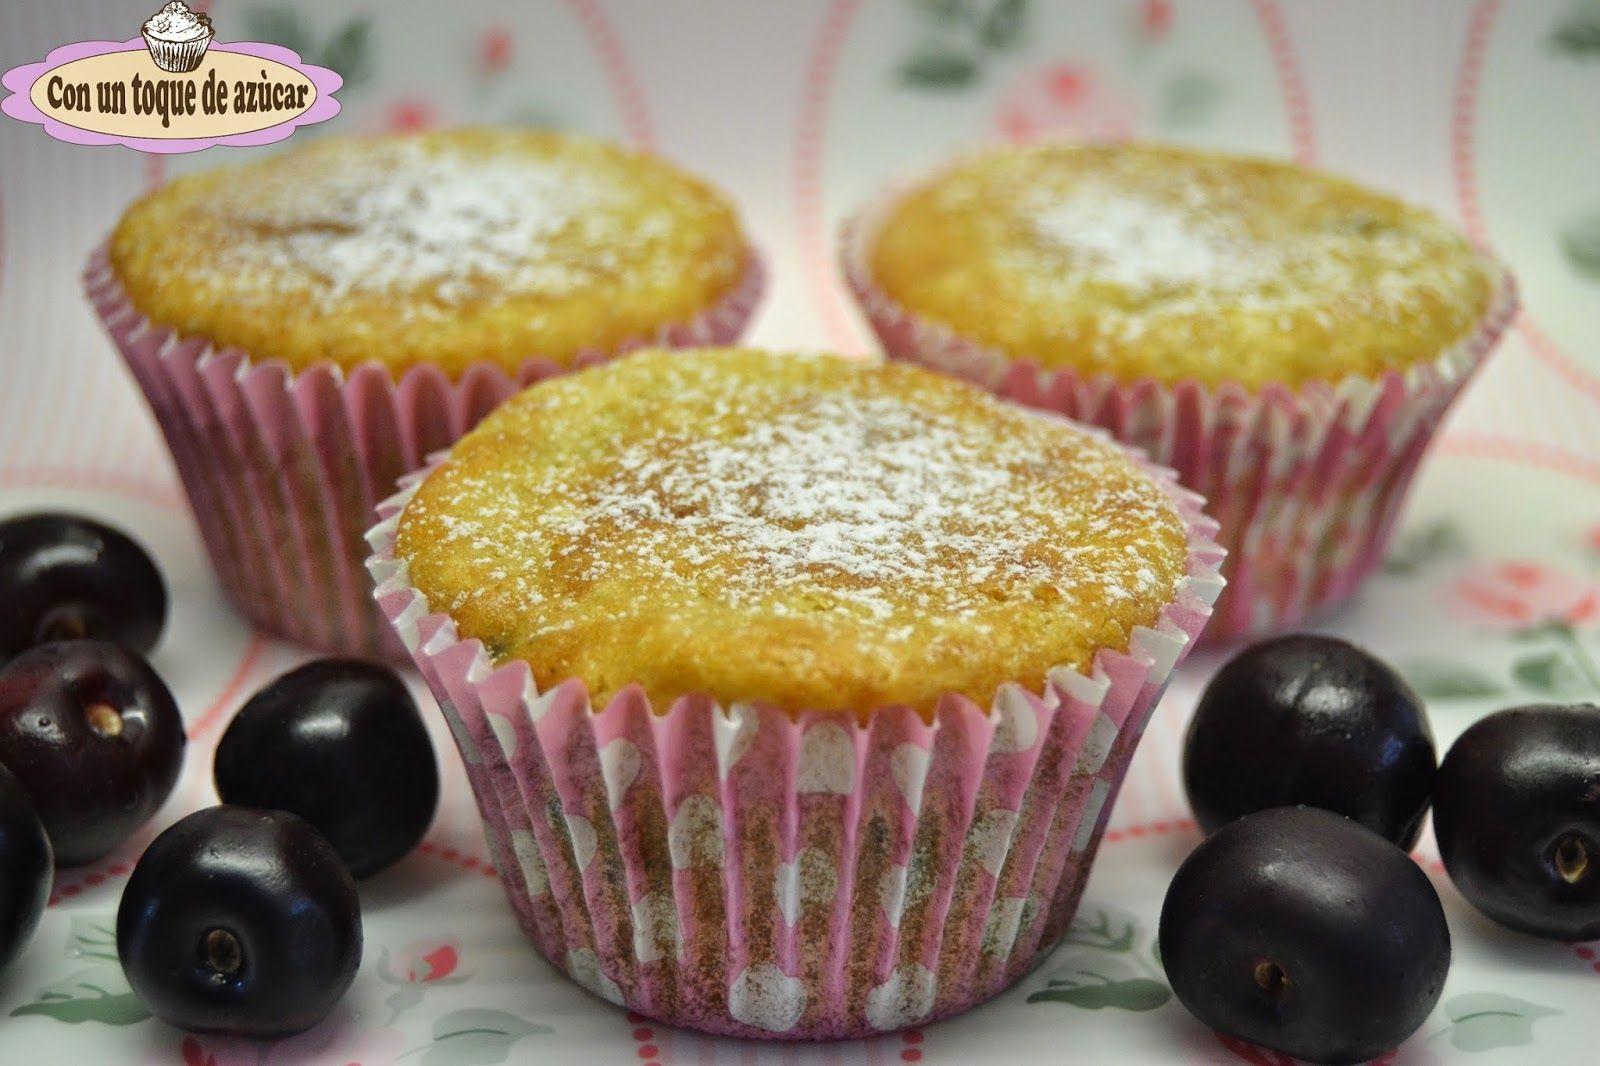 Muffins De Ricotta Y Cerezas